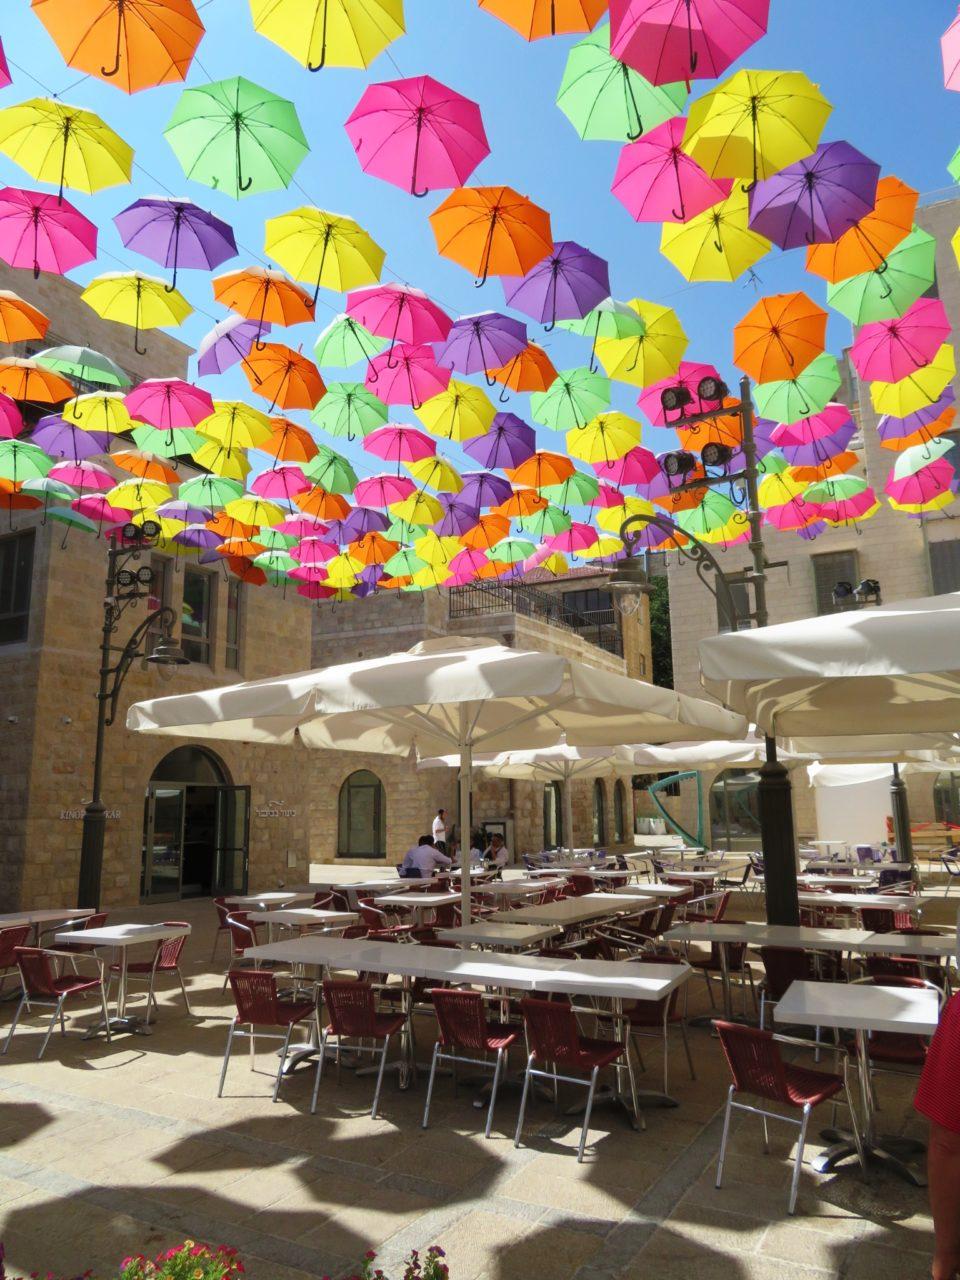 The joys of walking Jerusalem - Music Square (Kikar HaMusica)